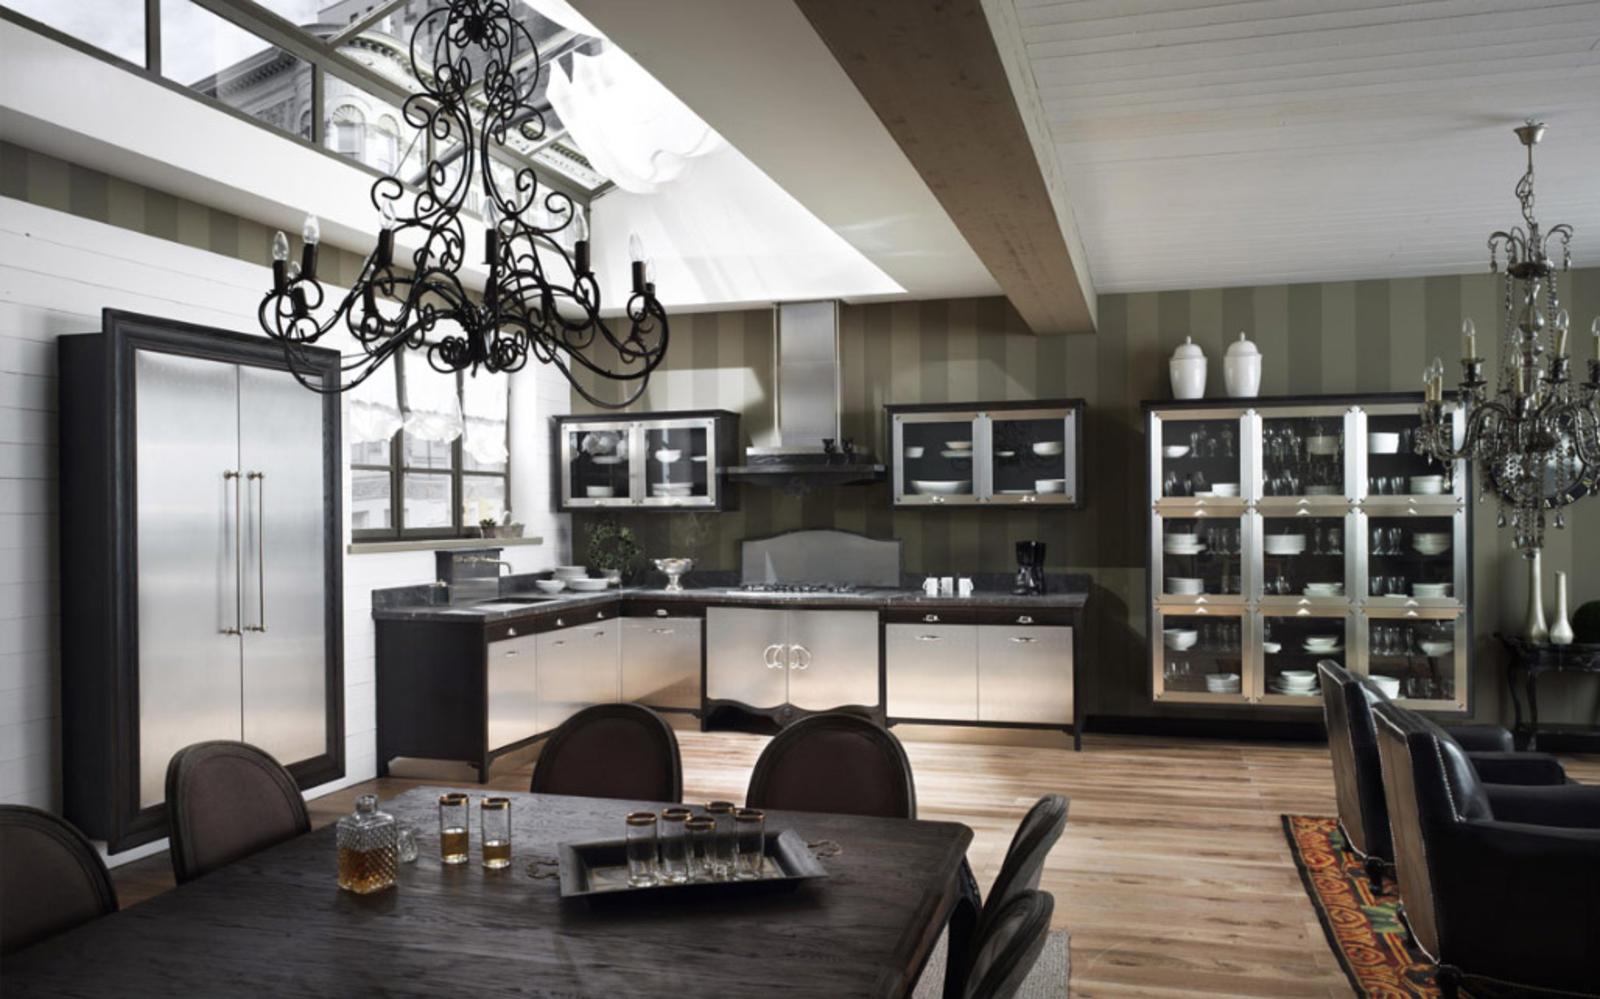 Modern classic kitchen interior design on vine for Classic contemporary kitchen